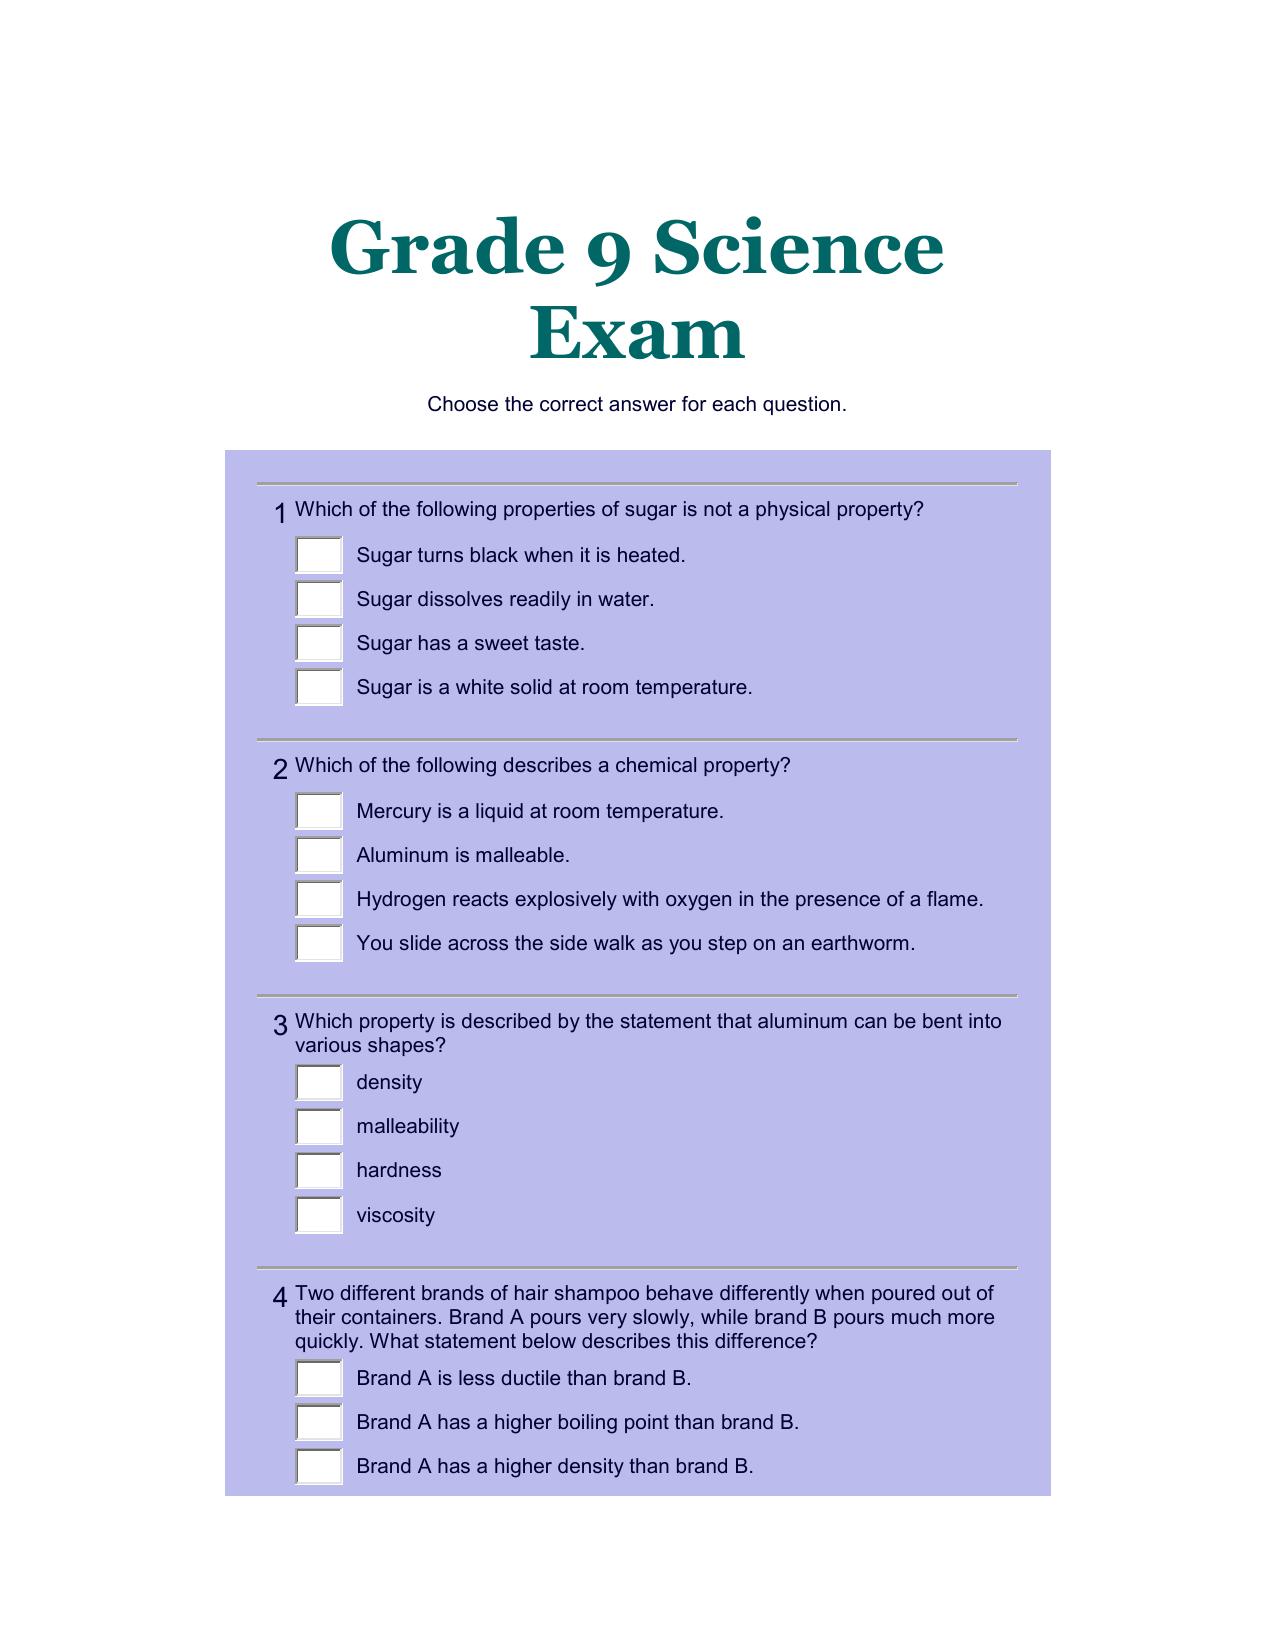 hight resolution of Grade 9 Science Exam1 - Chemistry